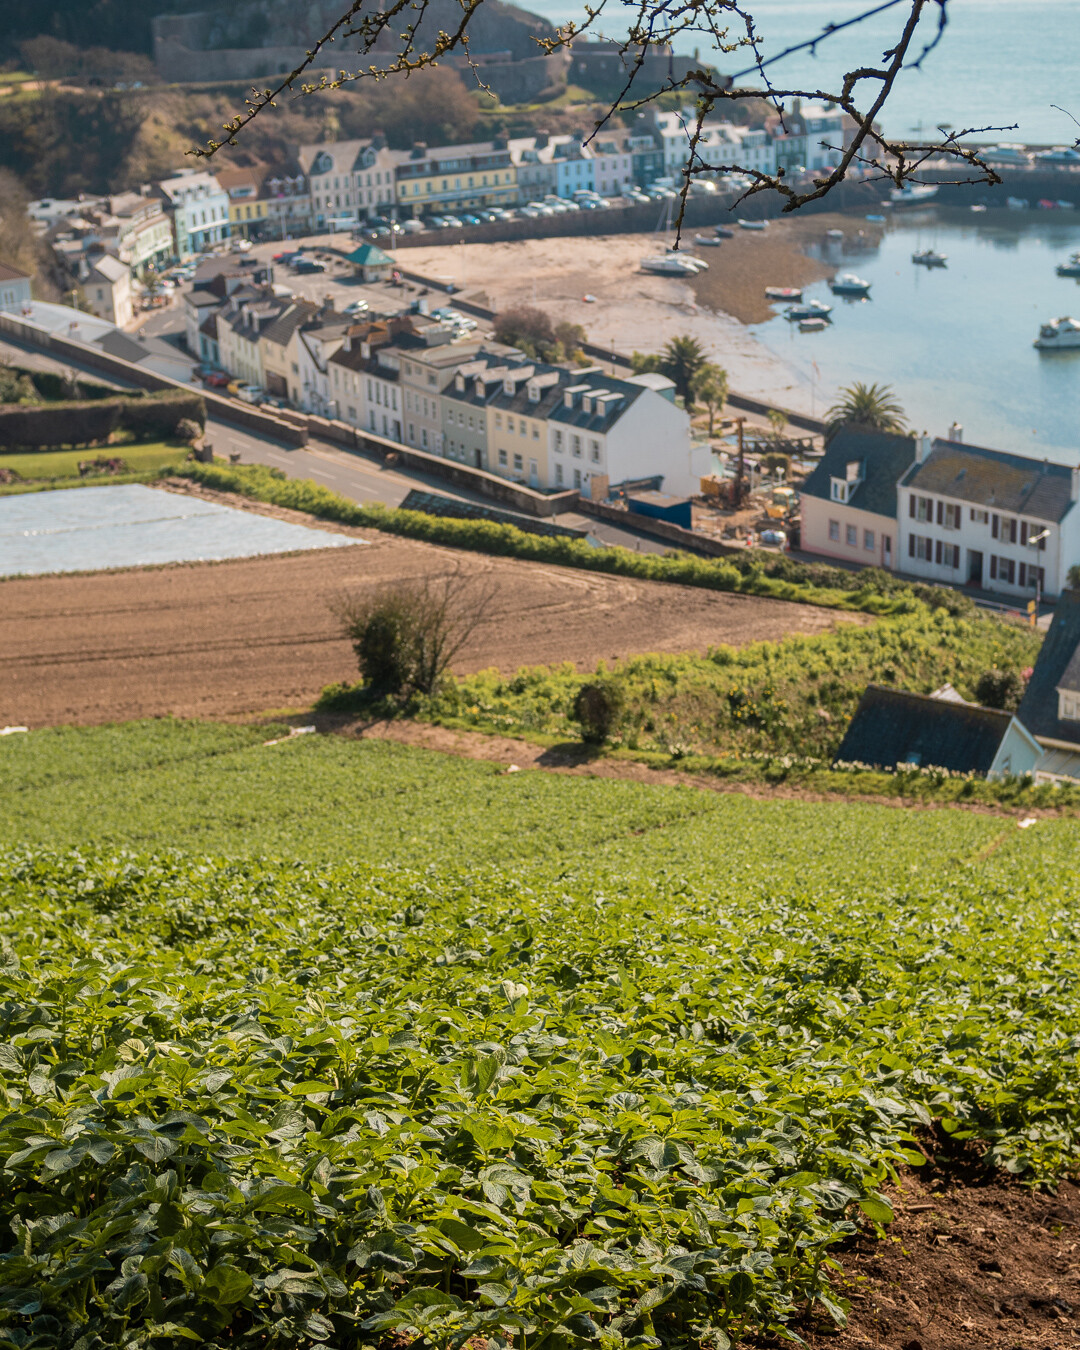 Jersey Royal potato fields